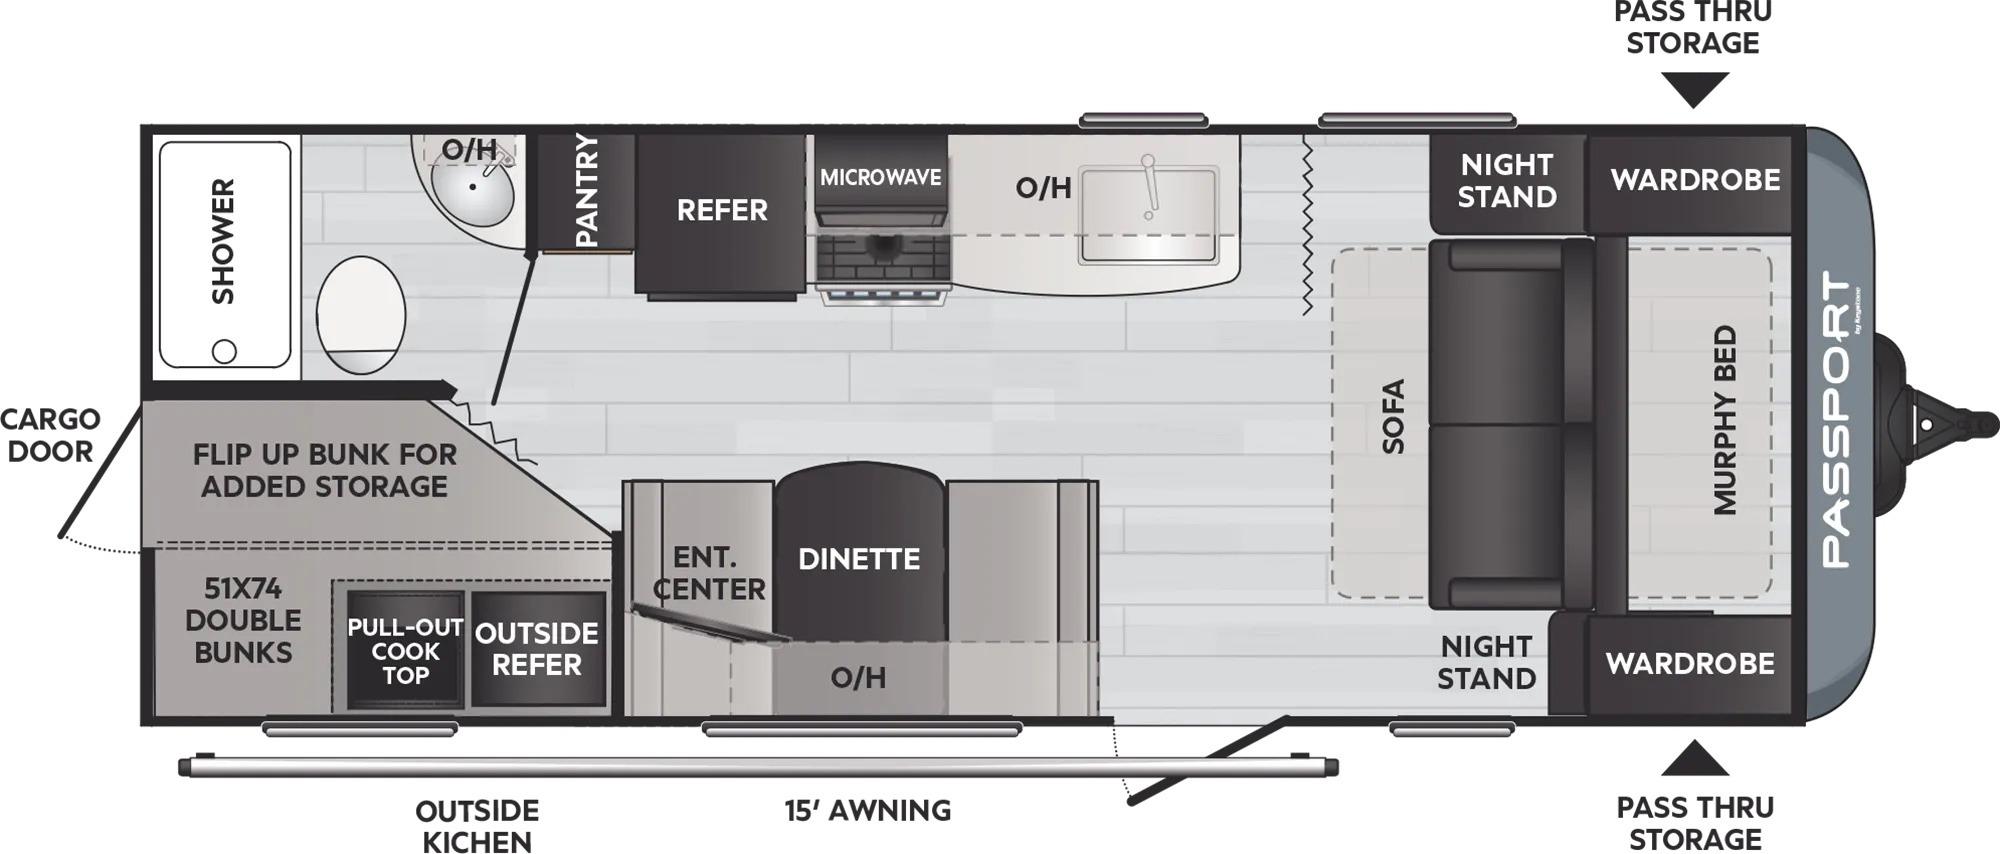 View Floor Plan for 2022 KEYSTONE PASSPORT 219BH